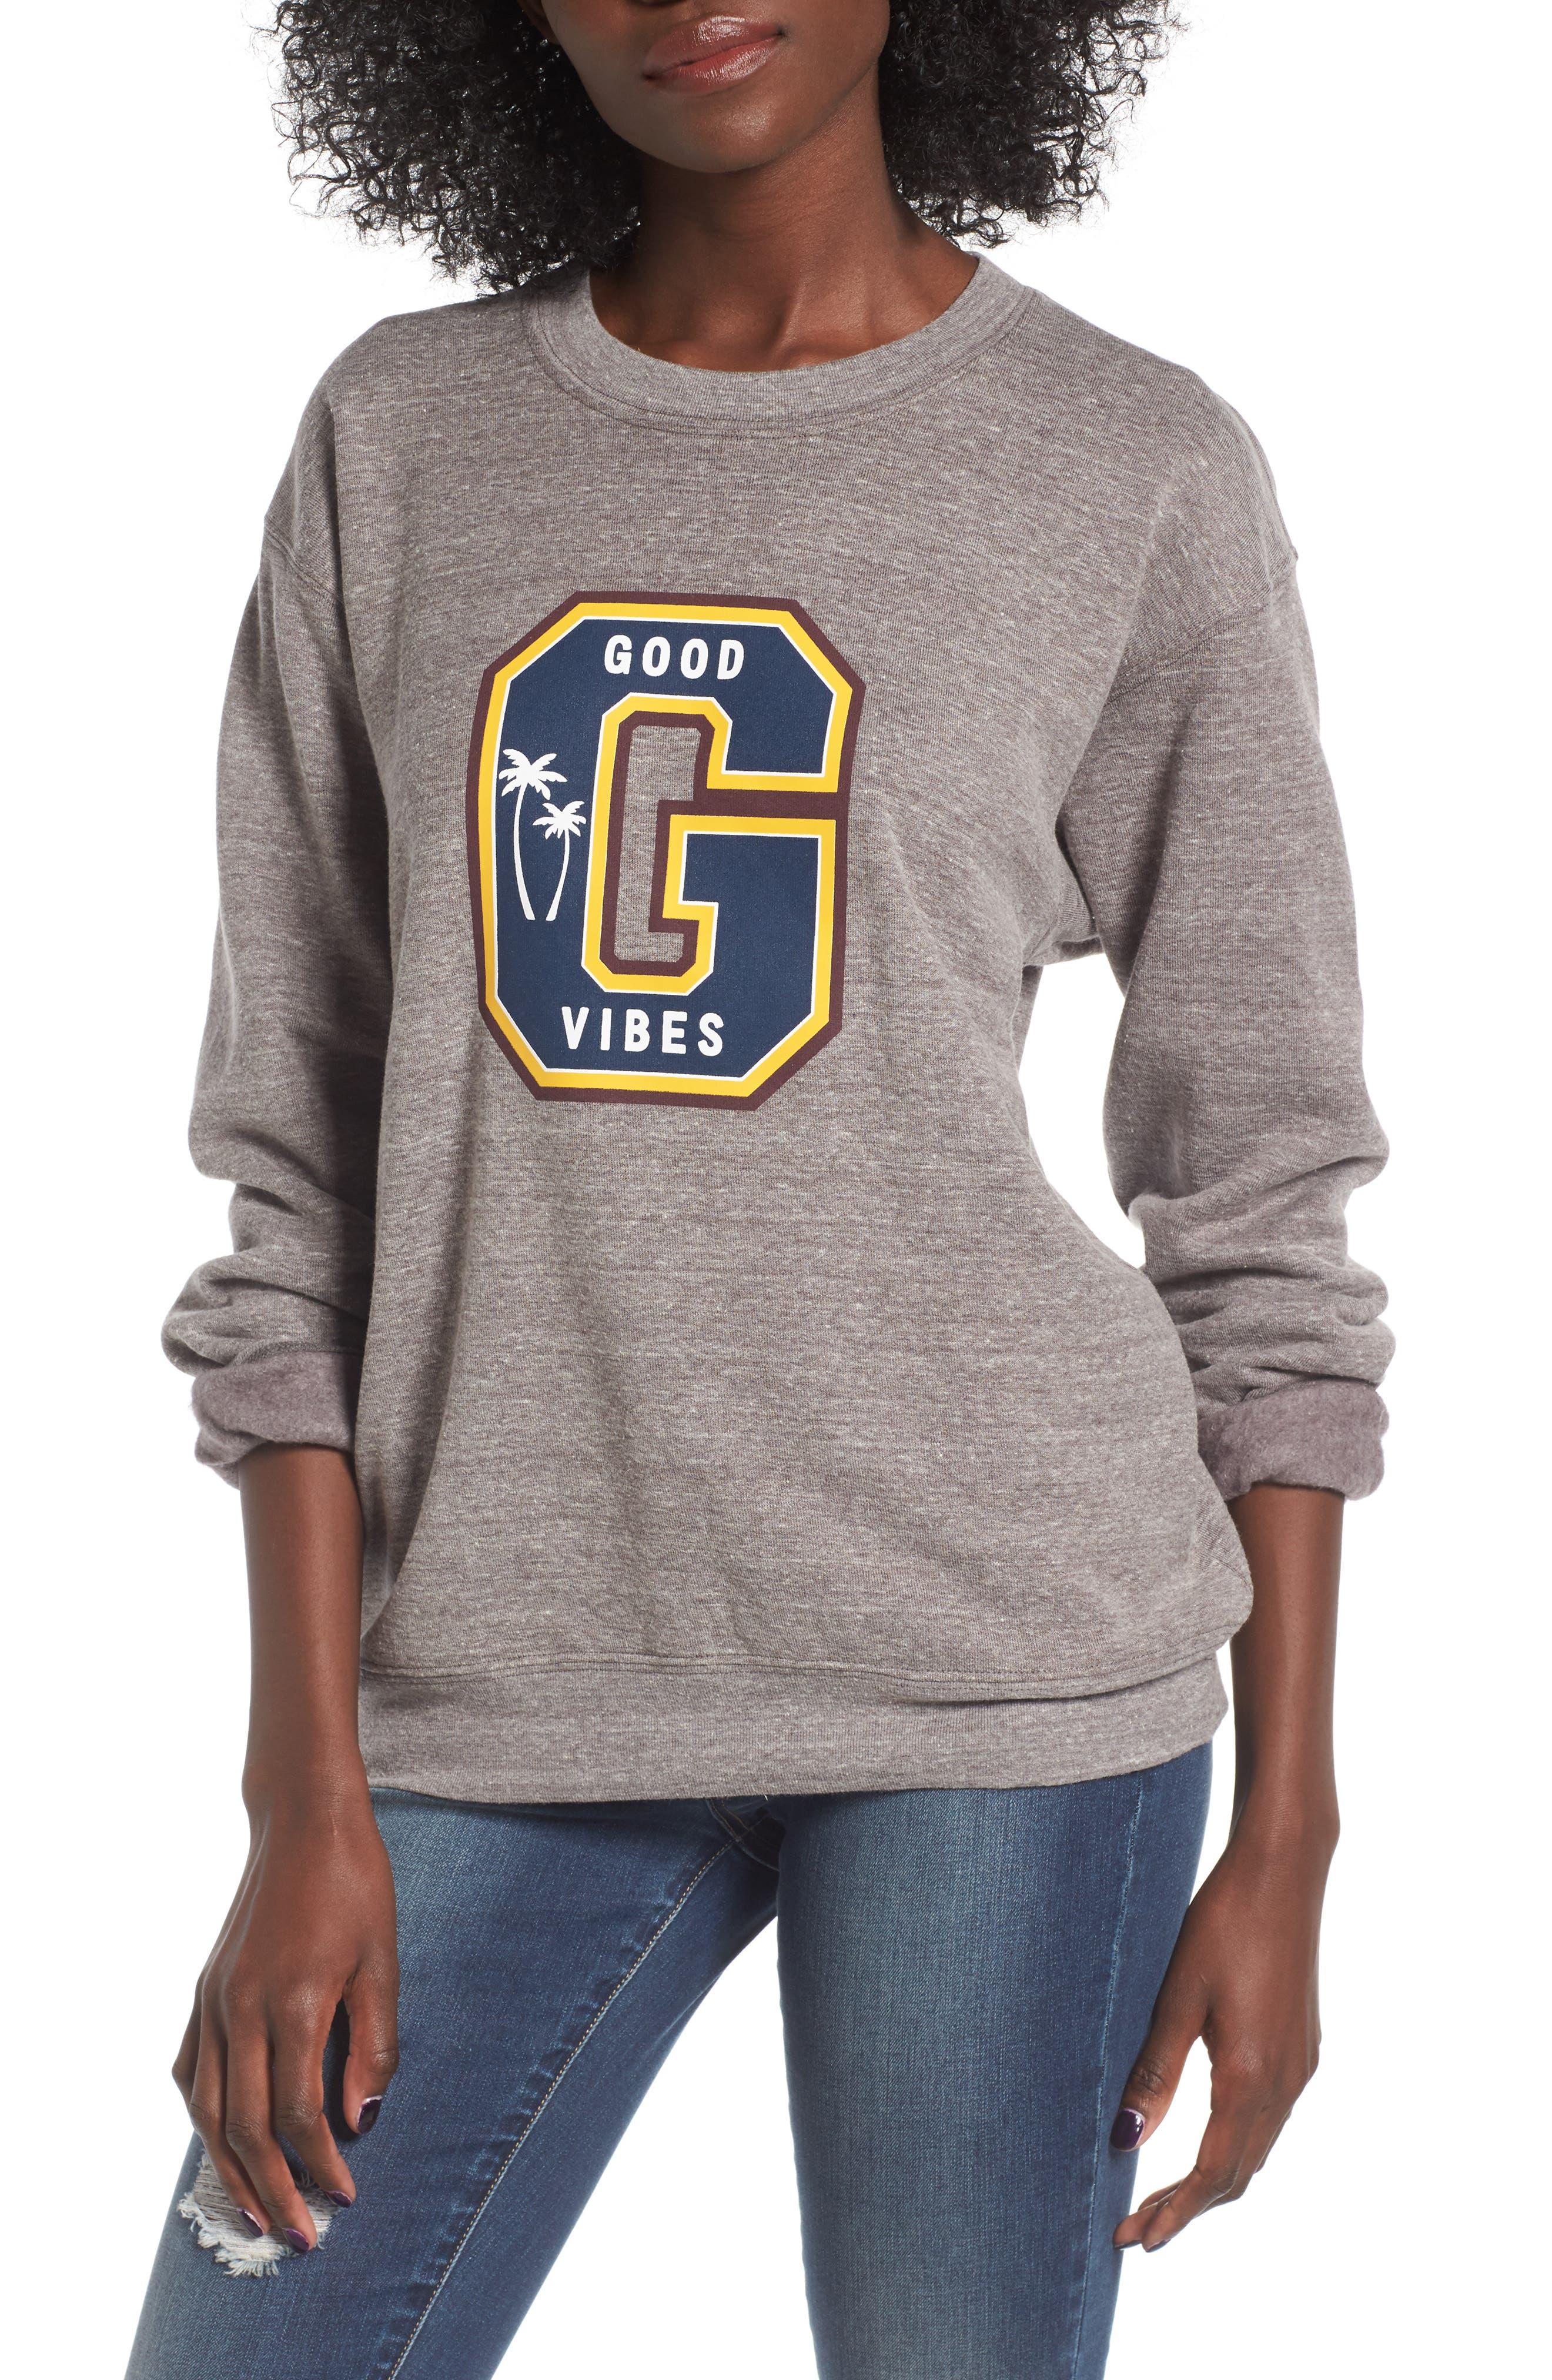 Sub_Urban Riot Good Vibes Varsity Sweatshirt